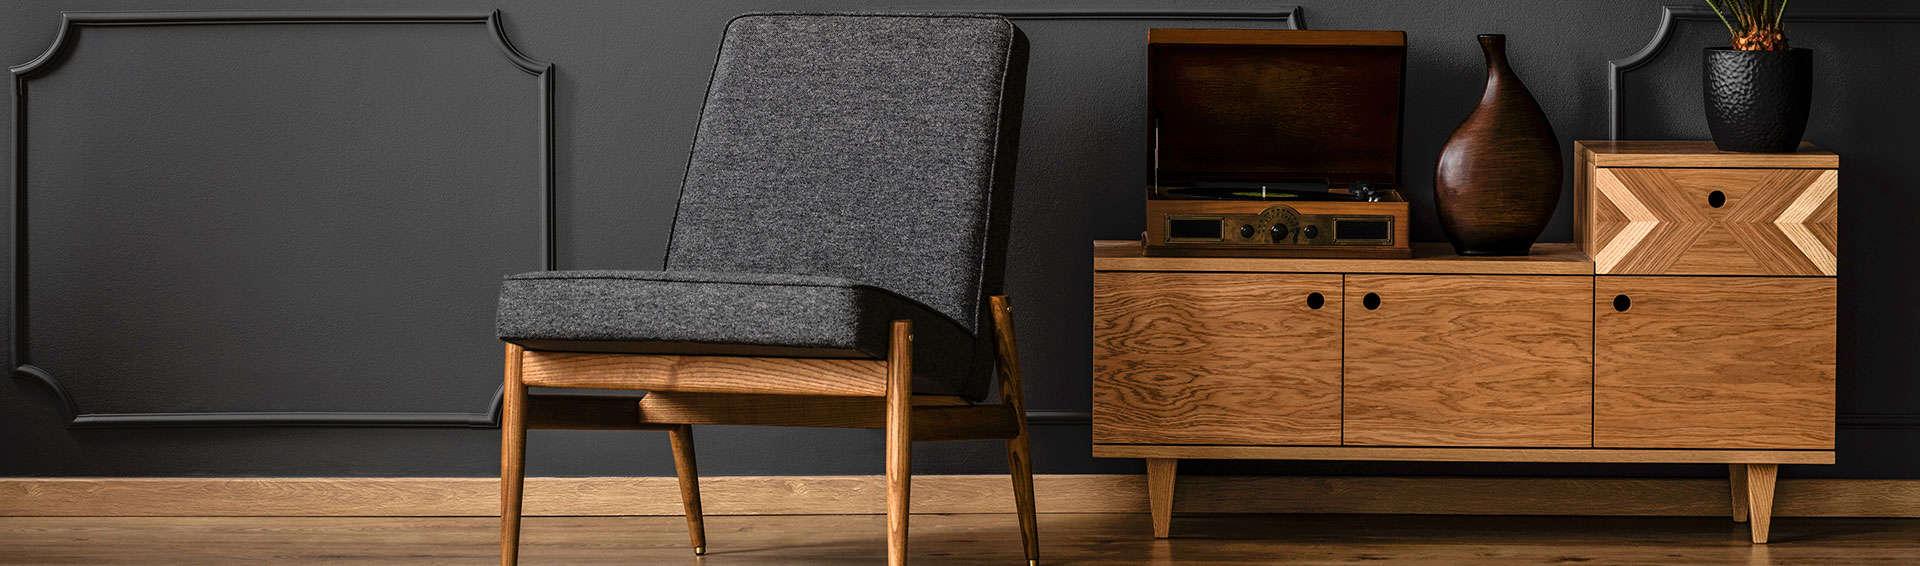 Ironbark-Furniture-01